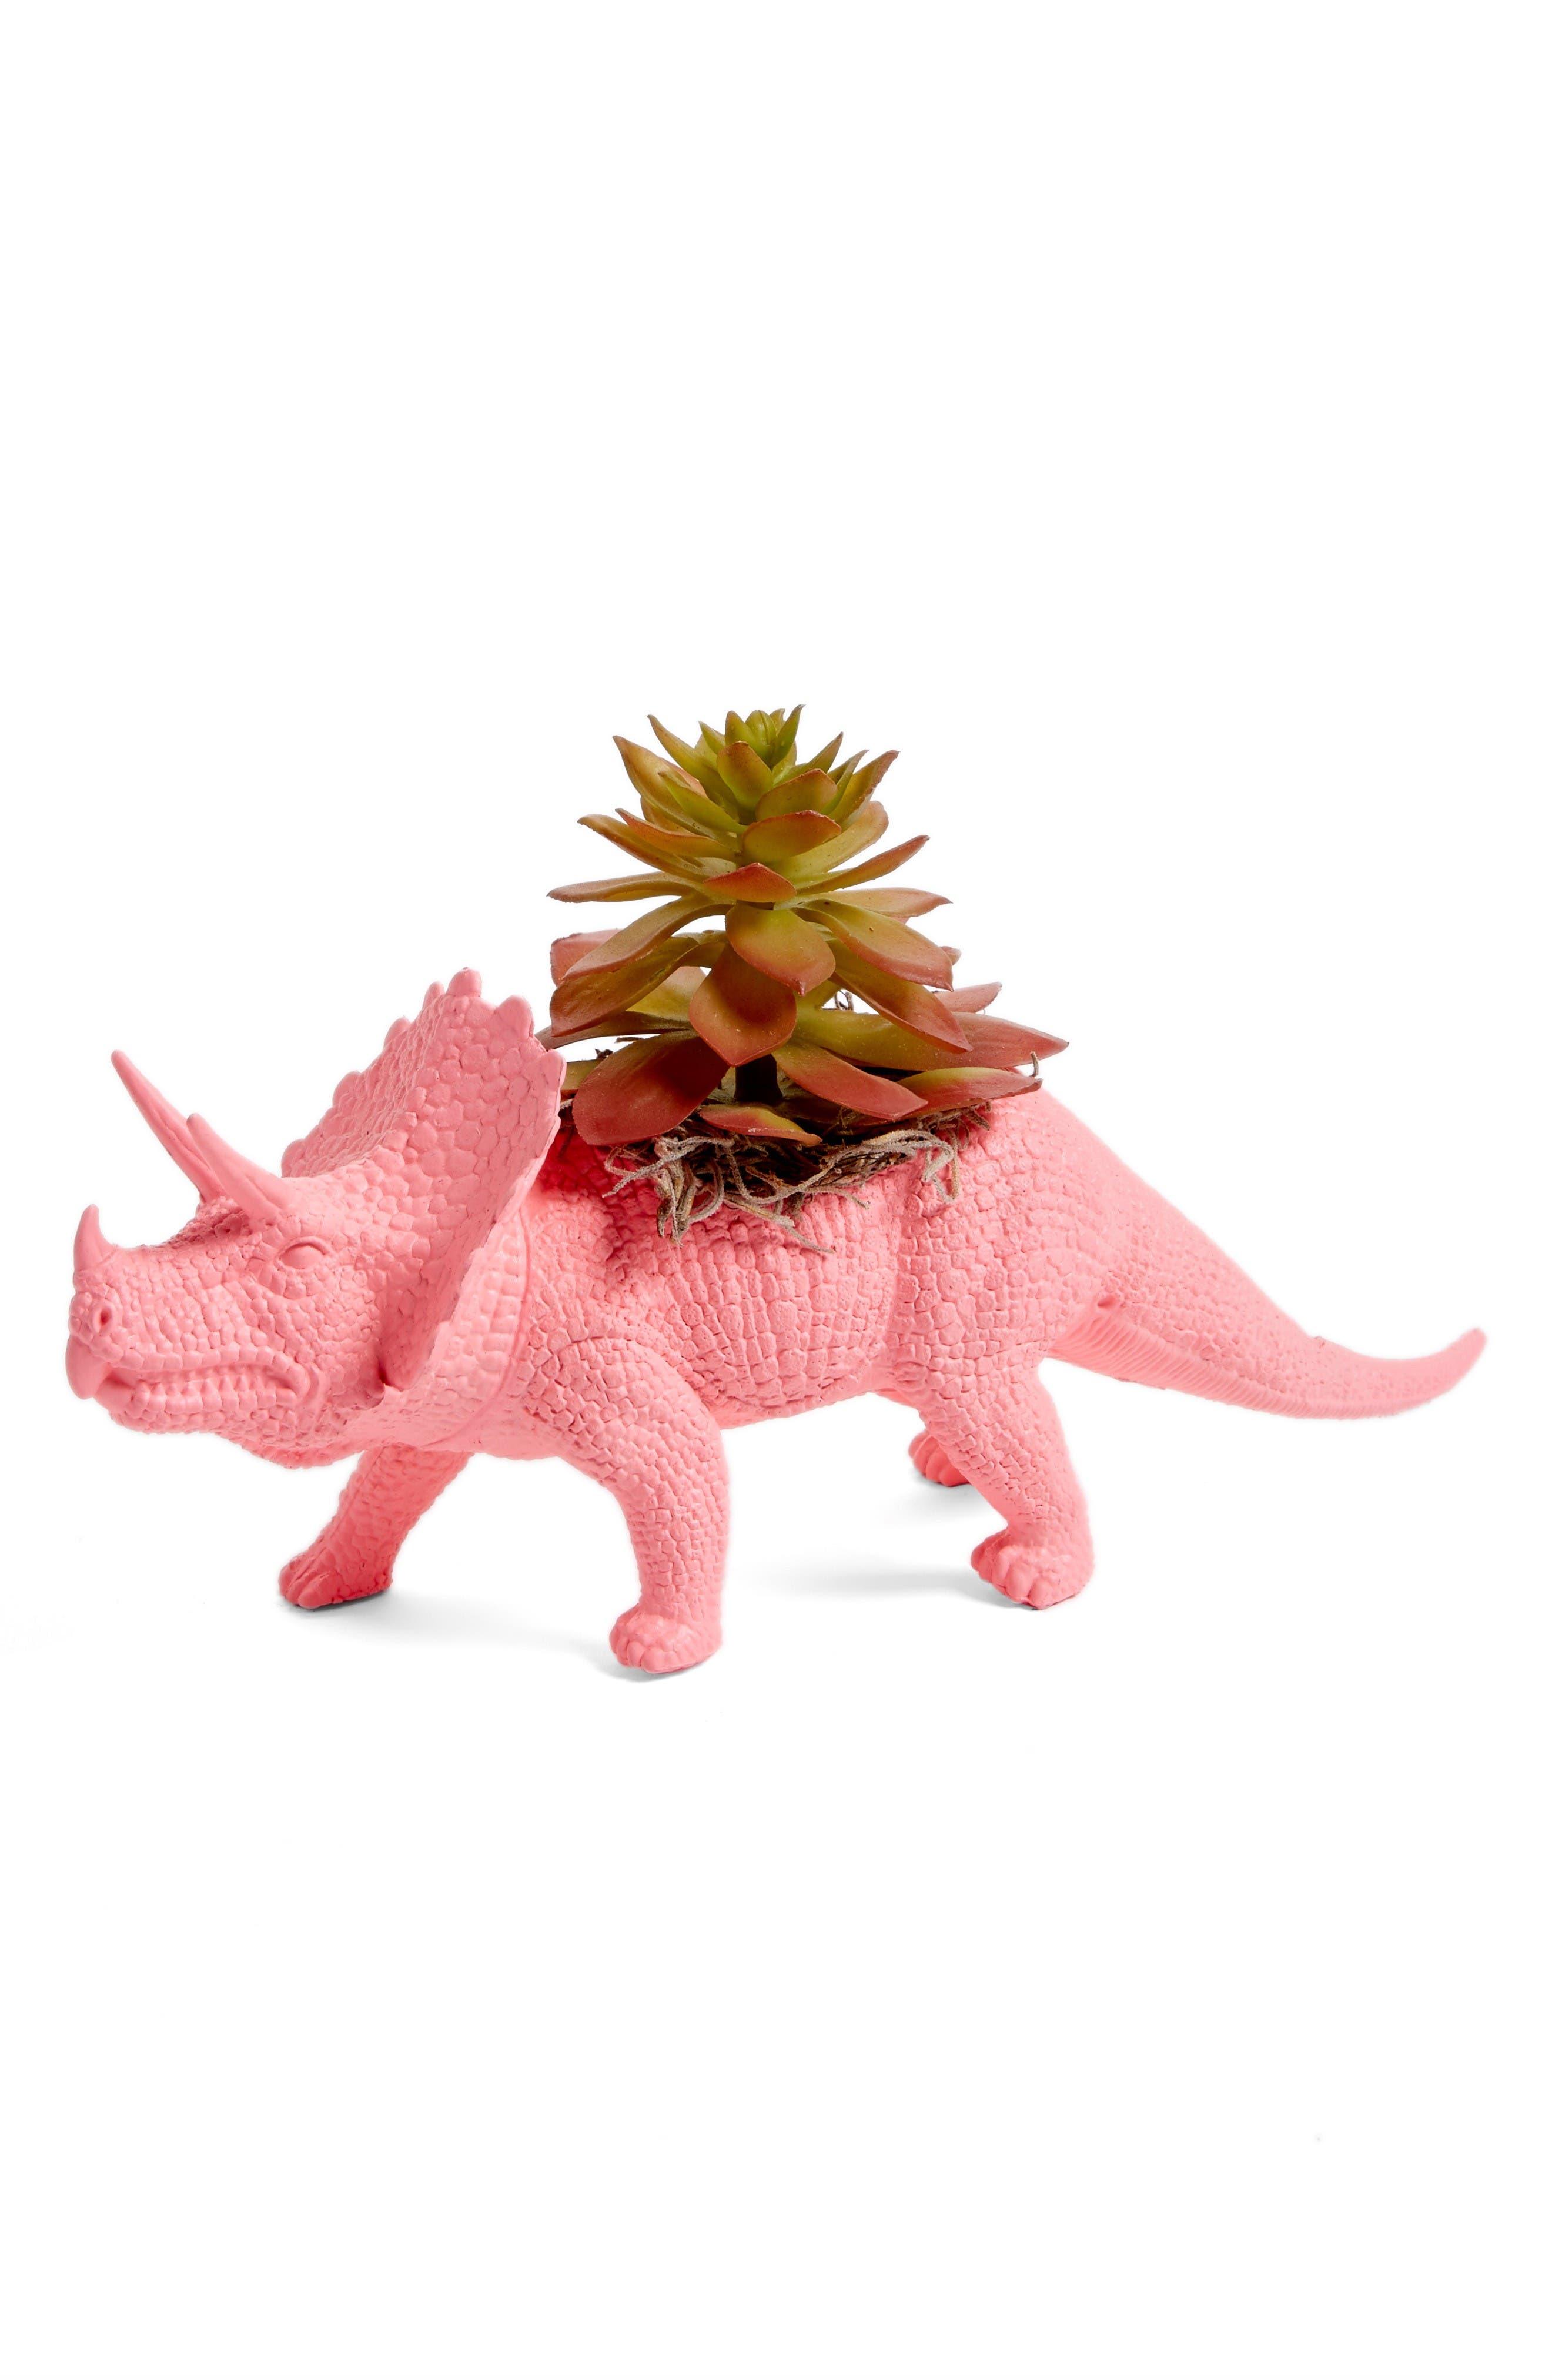 Plaid Pigeon Triceratops Faux Planter